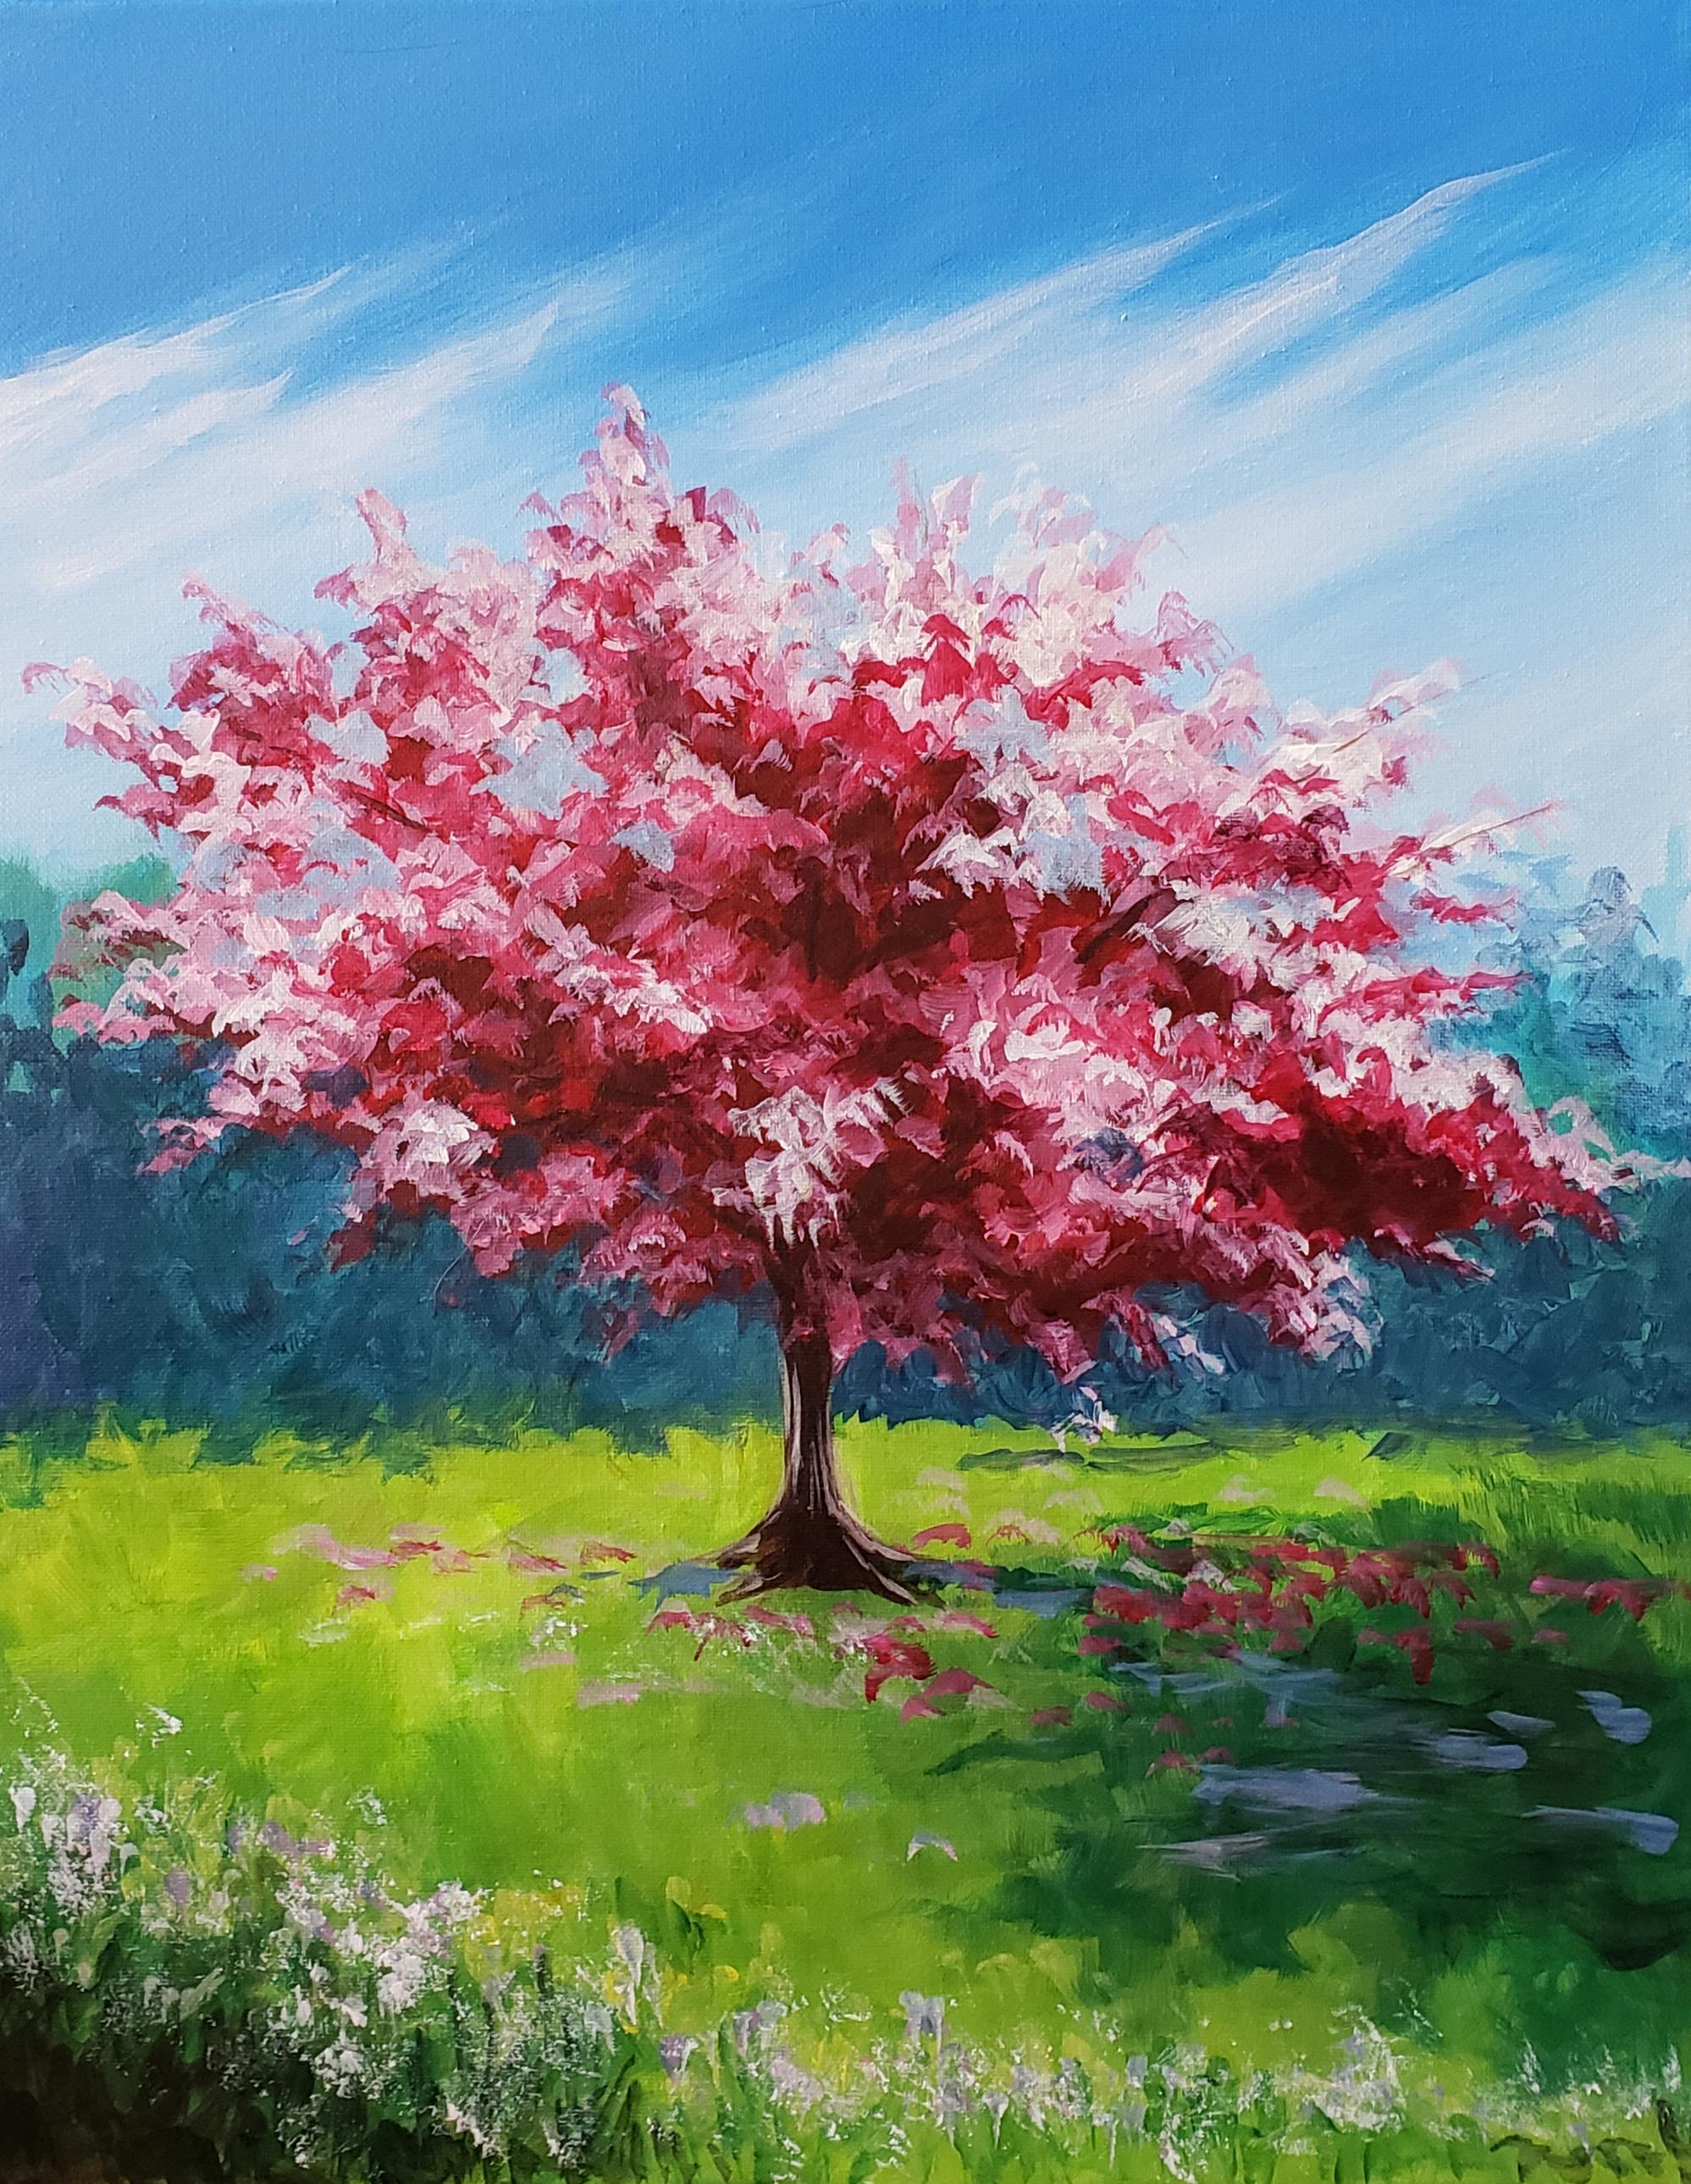 Sonja Forster Art - Happy Art - Spring Blossoms_original.jpg